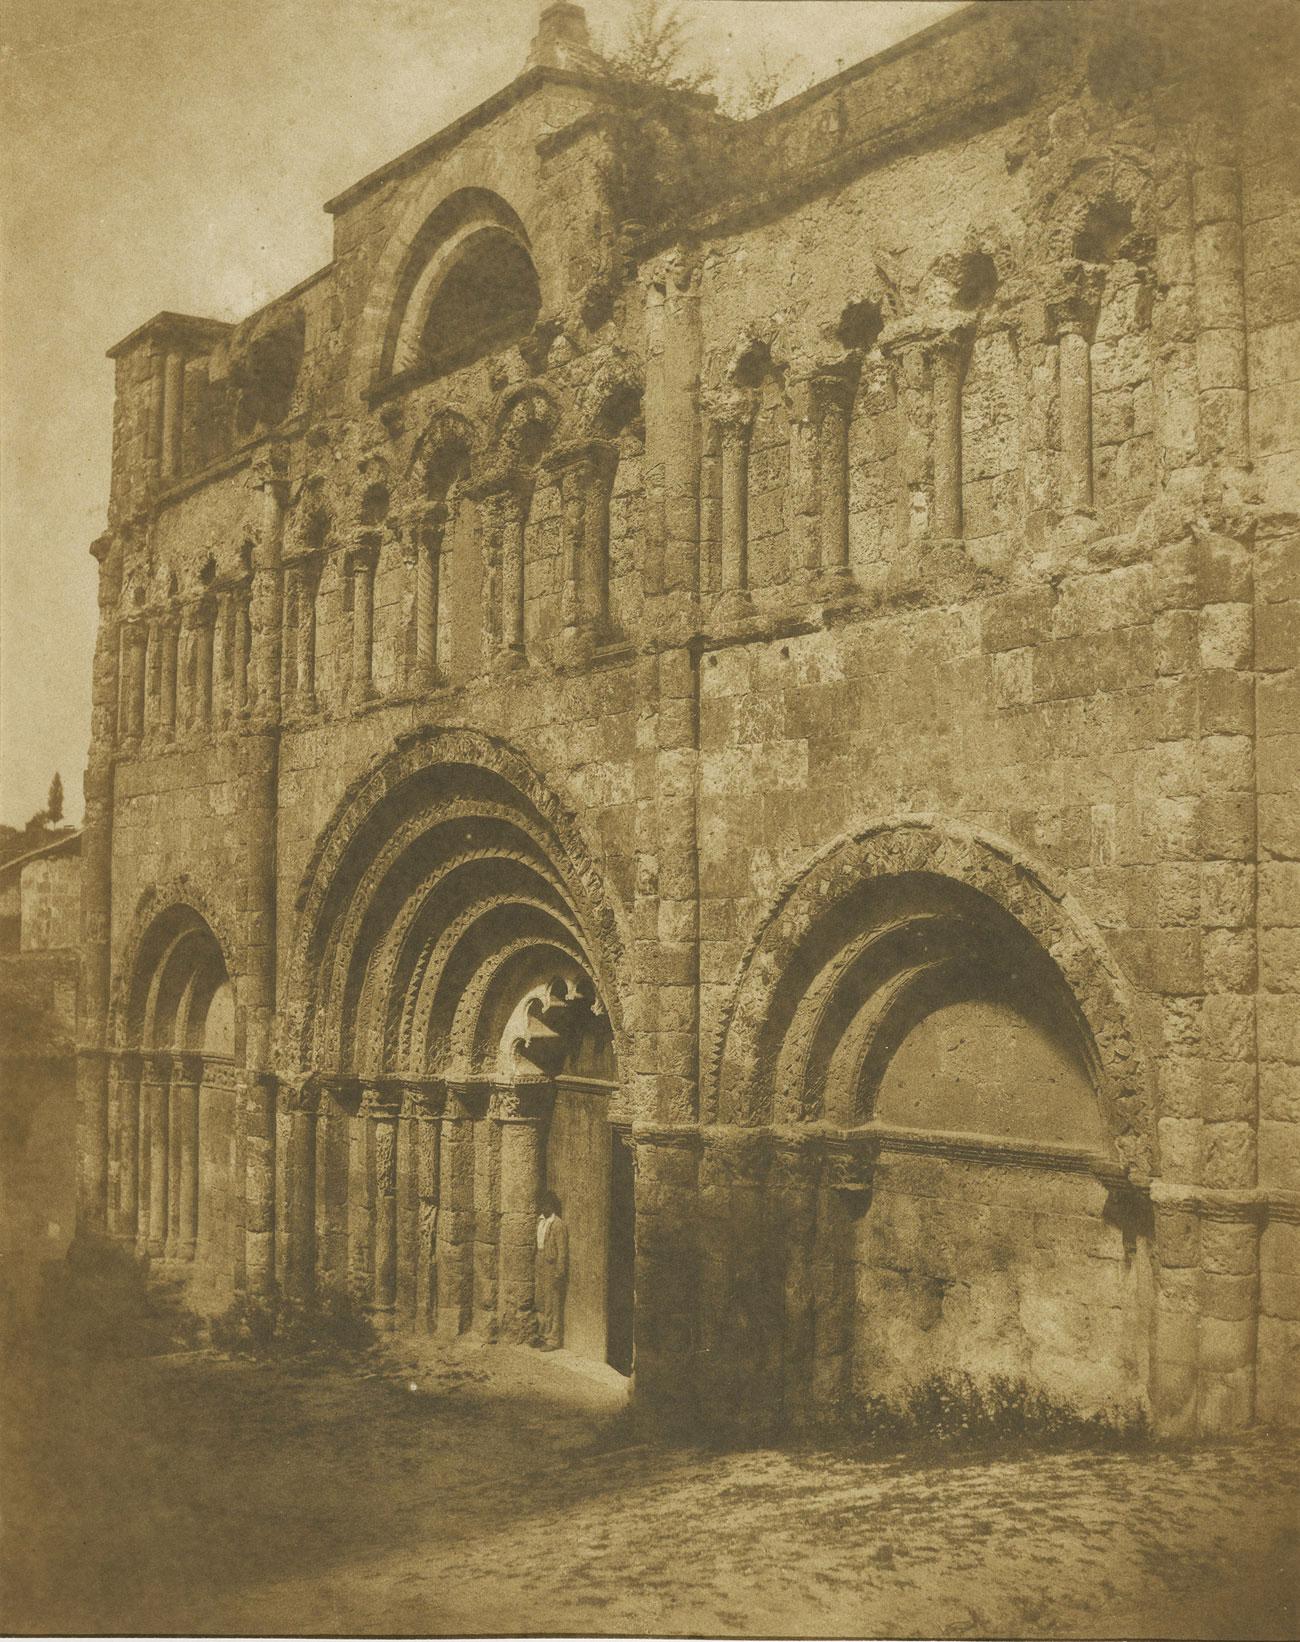 West Facade of the Church of Saint-Jacques, Aubeterre-sur-Dronne / Le Gray & Mestral